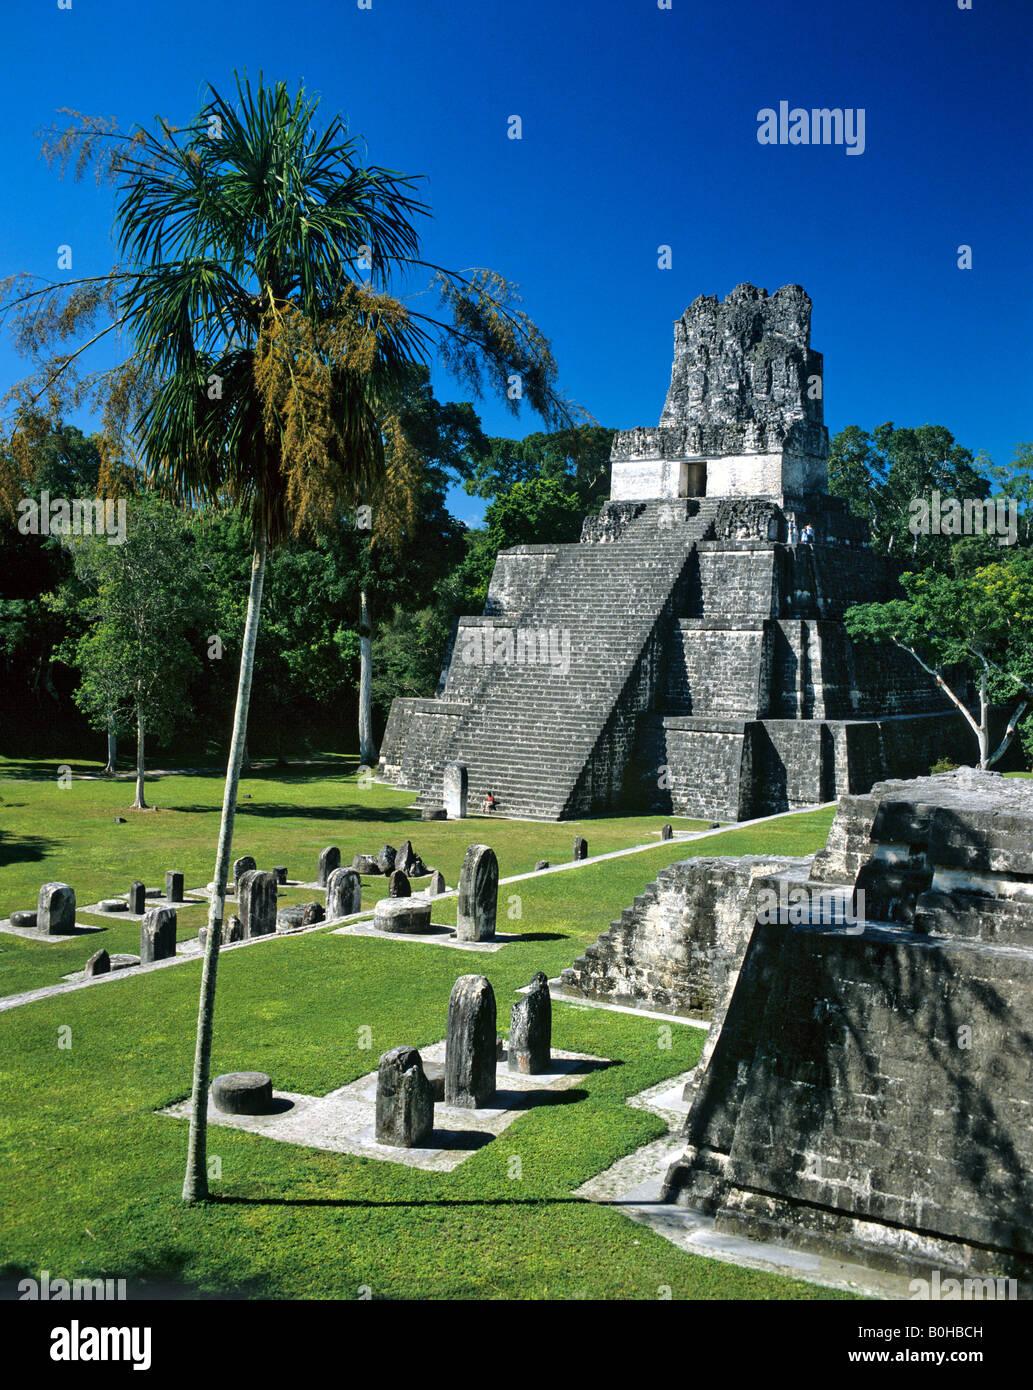 Temple ruins of Tikal, Maya pyramid, Guatemala, Guatemala, Central America - Stock Image